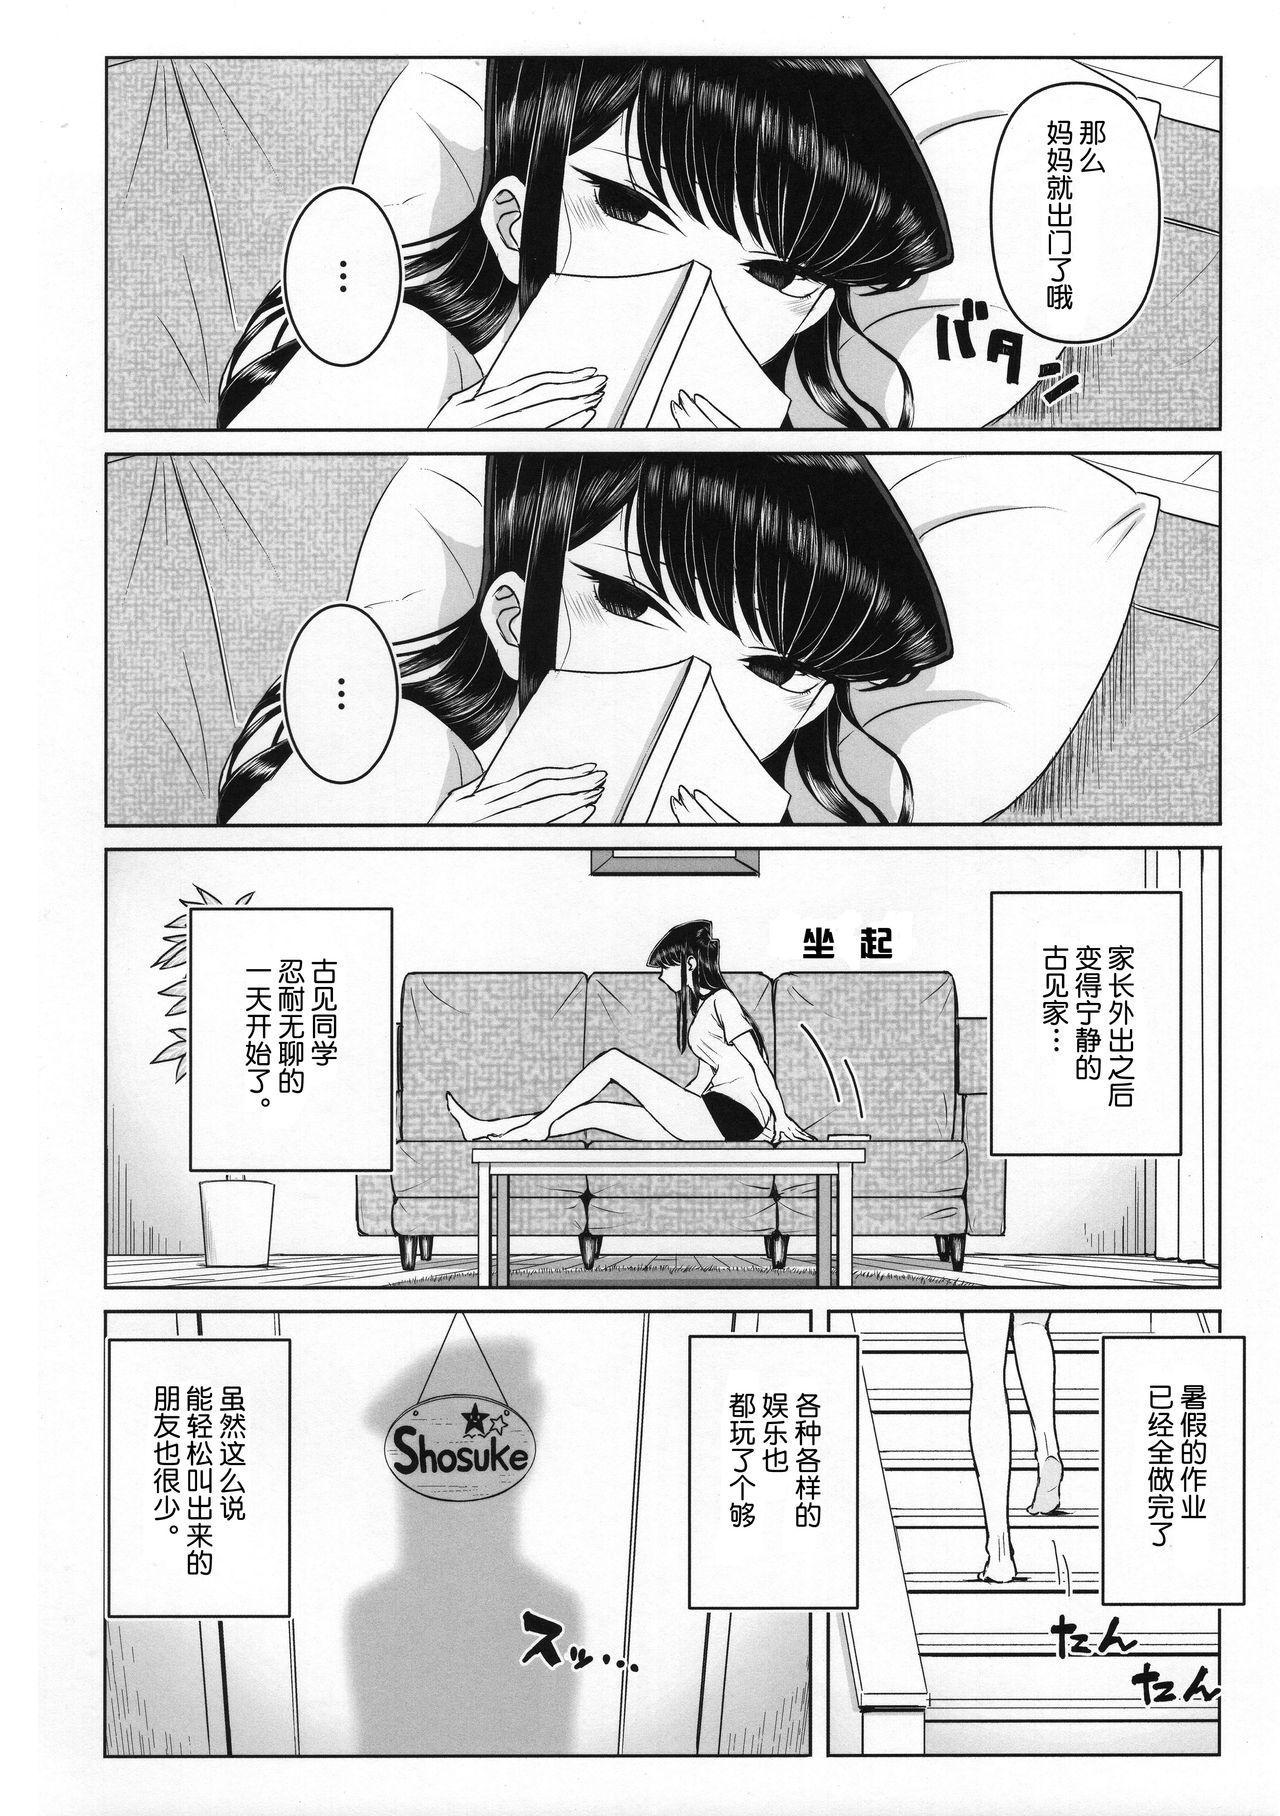 Komi-ke no Kyoudai Asobi 5